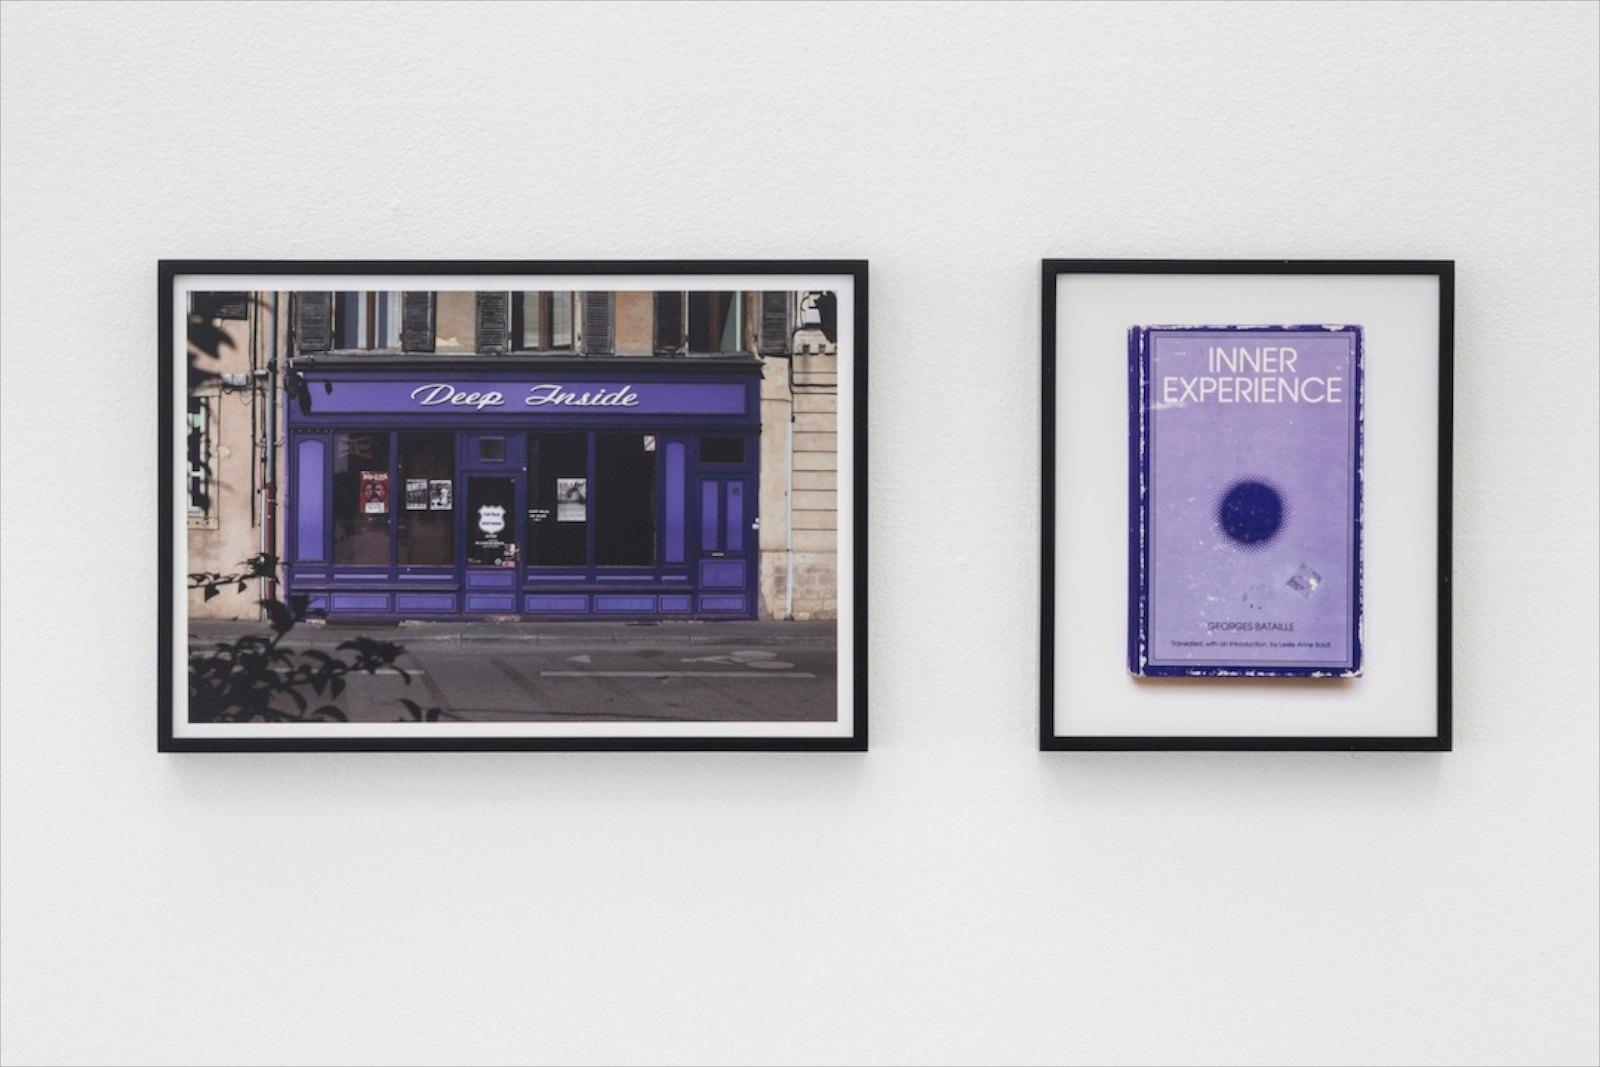 Lisa Tan, Deep Inside Inner Experience, 2009, Photograph diptych, 44,45 x 30,48 cm and 25,4 x 30,48, Ed. 5